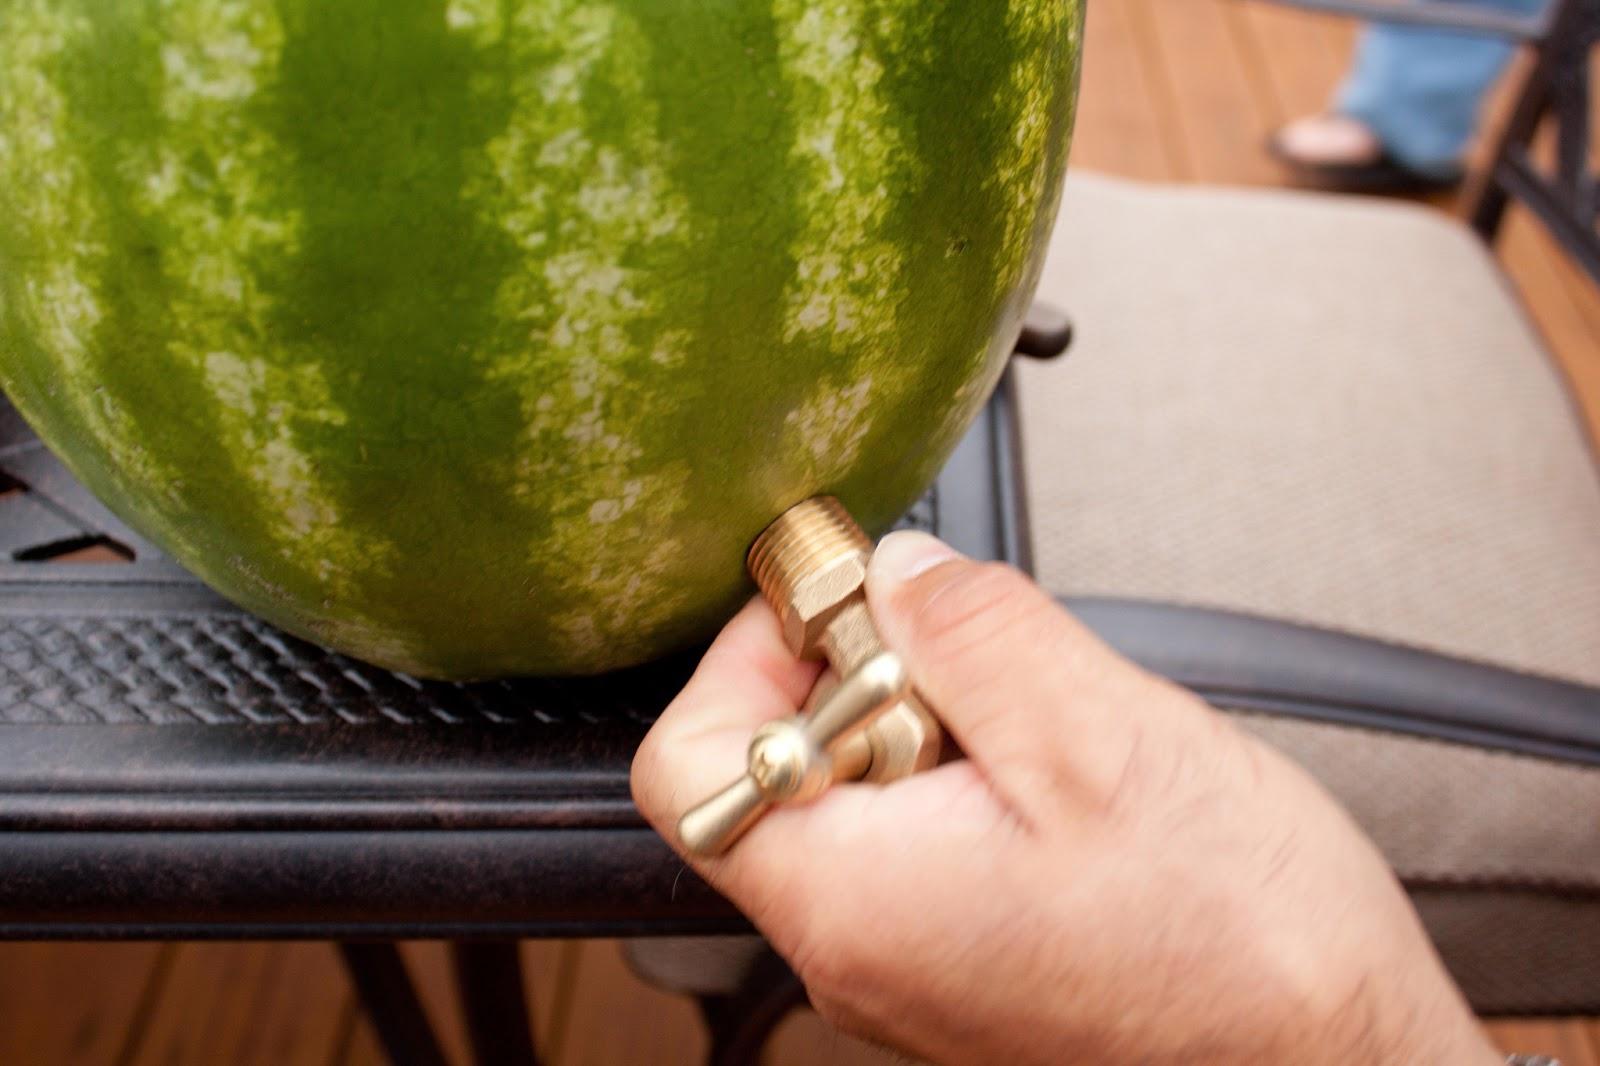 Fat and Happy Blog: Watermelon Beverage Dispenser aka Cocktail Keg ...